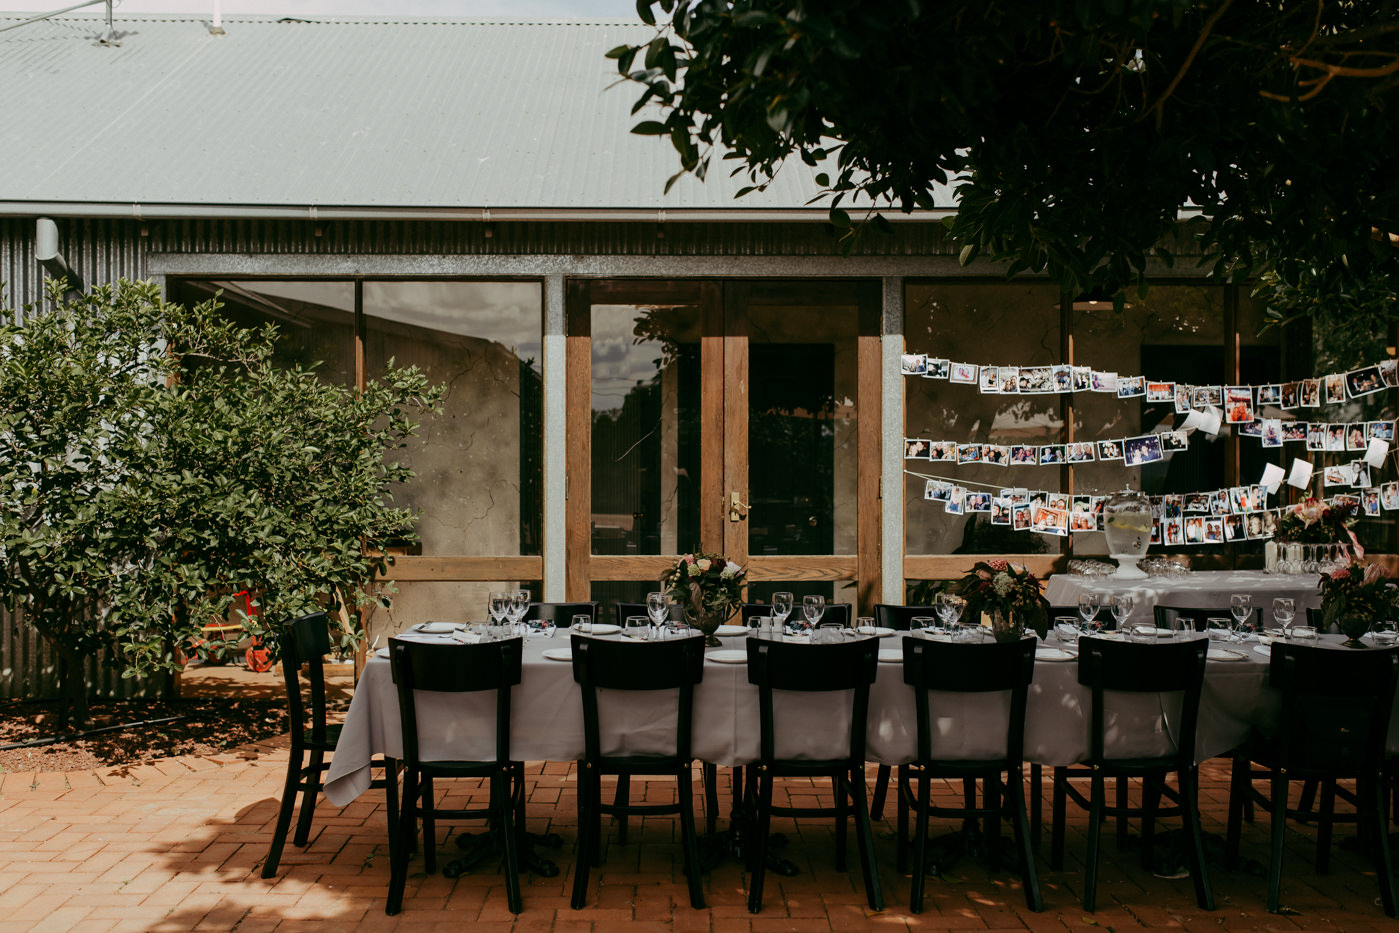 Anthony & Eliet - Wagga Wagga Wedding - Country NSW - Samantha Heather Photography-87.jpg